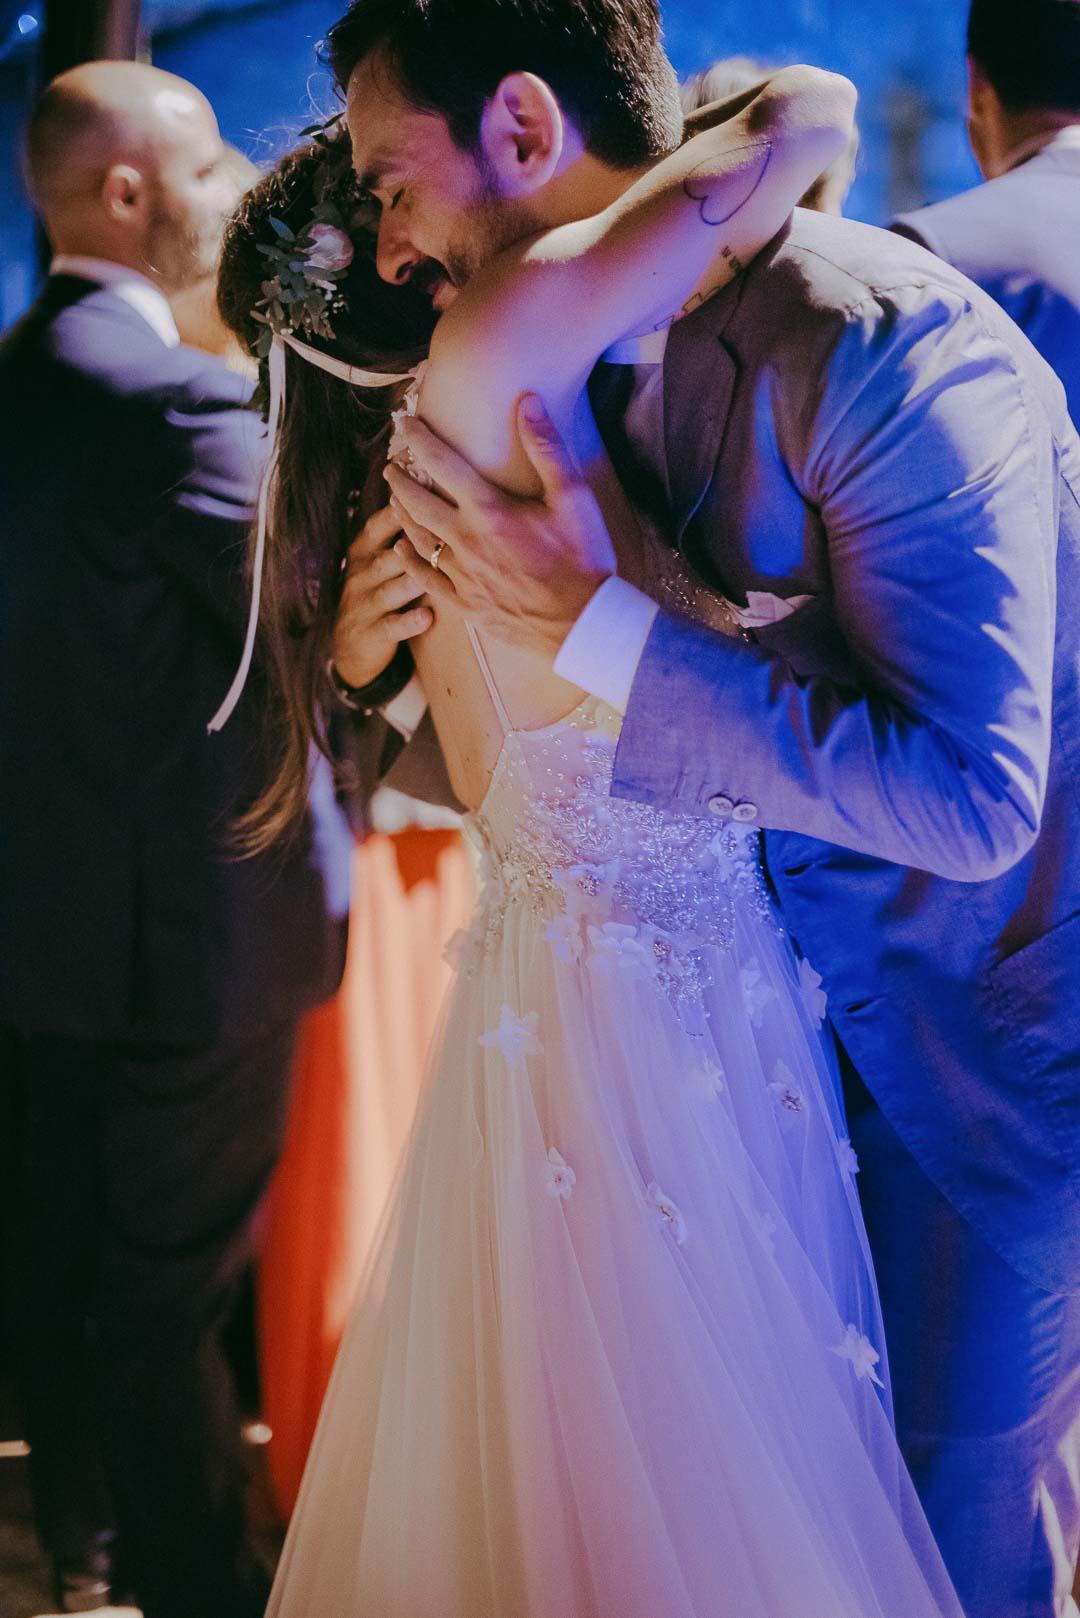 wedding-photographer-destination-fineart-bespoke-reportage-amalficoast-torrelacerniola-vivianeizzo-spazio46-102